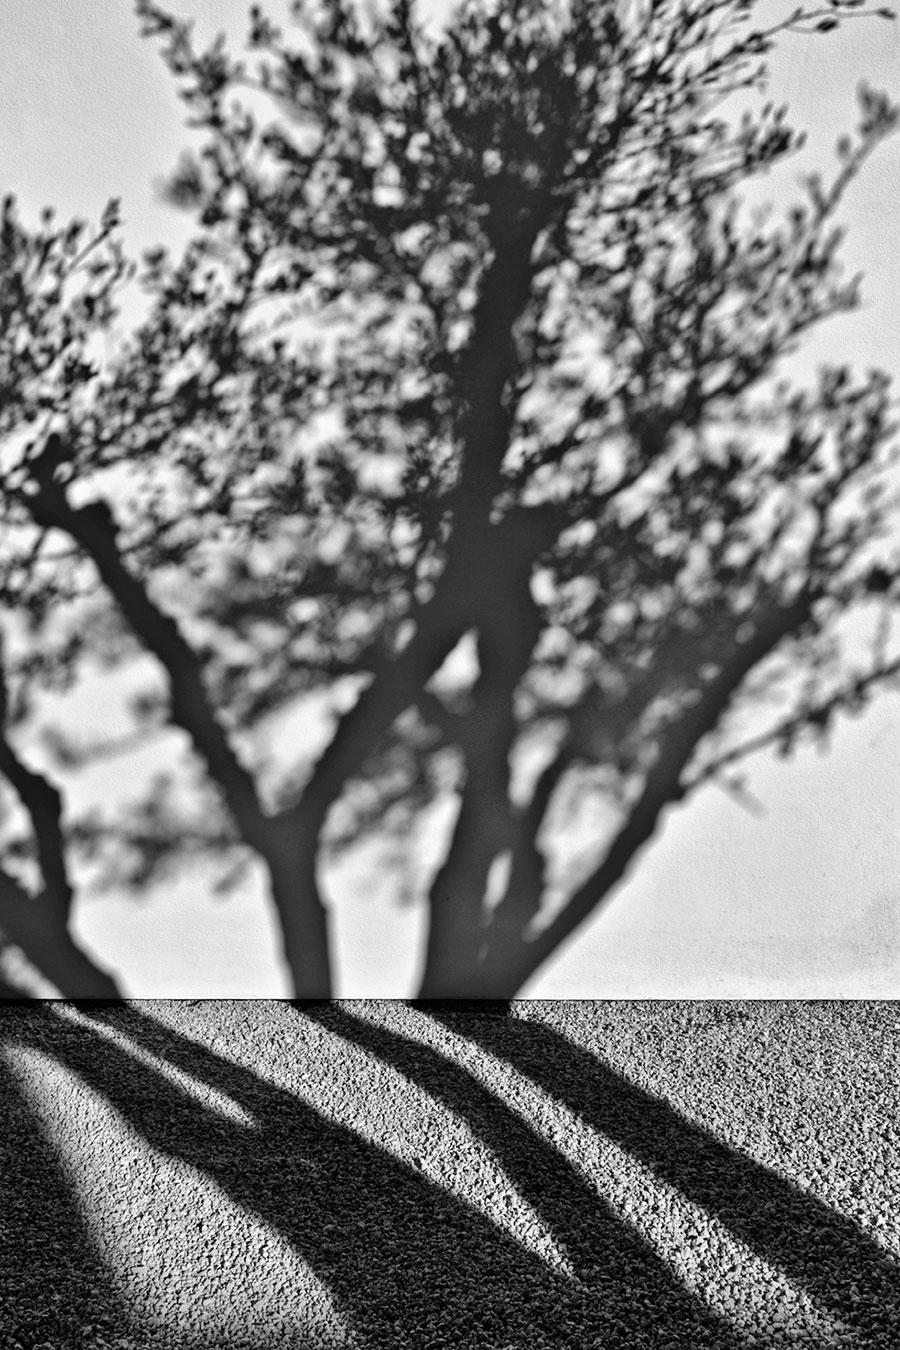 Photo © Serge Anton.